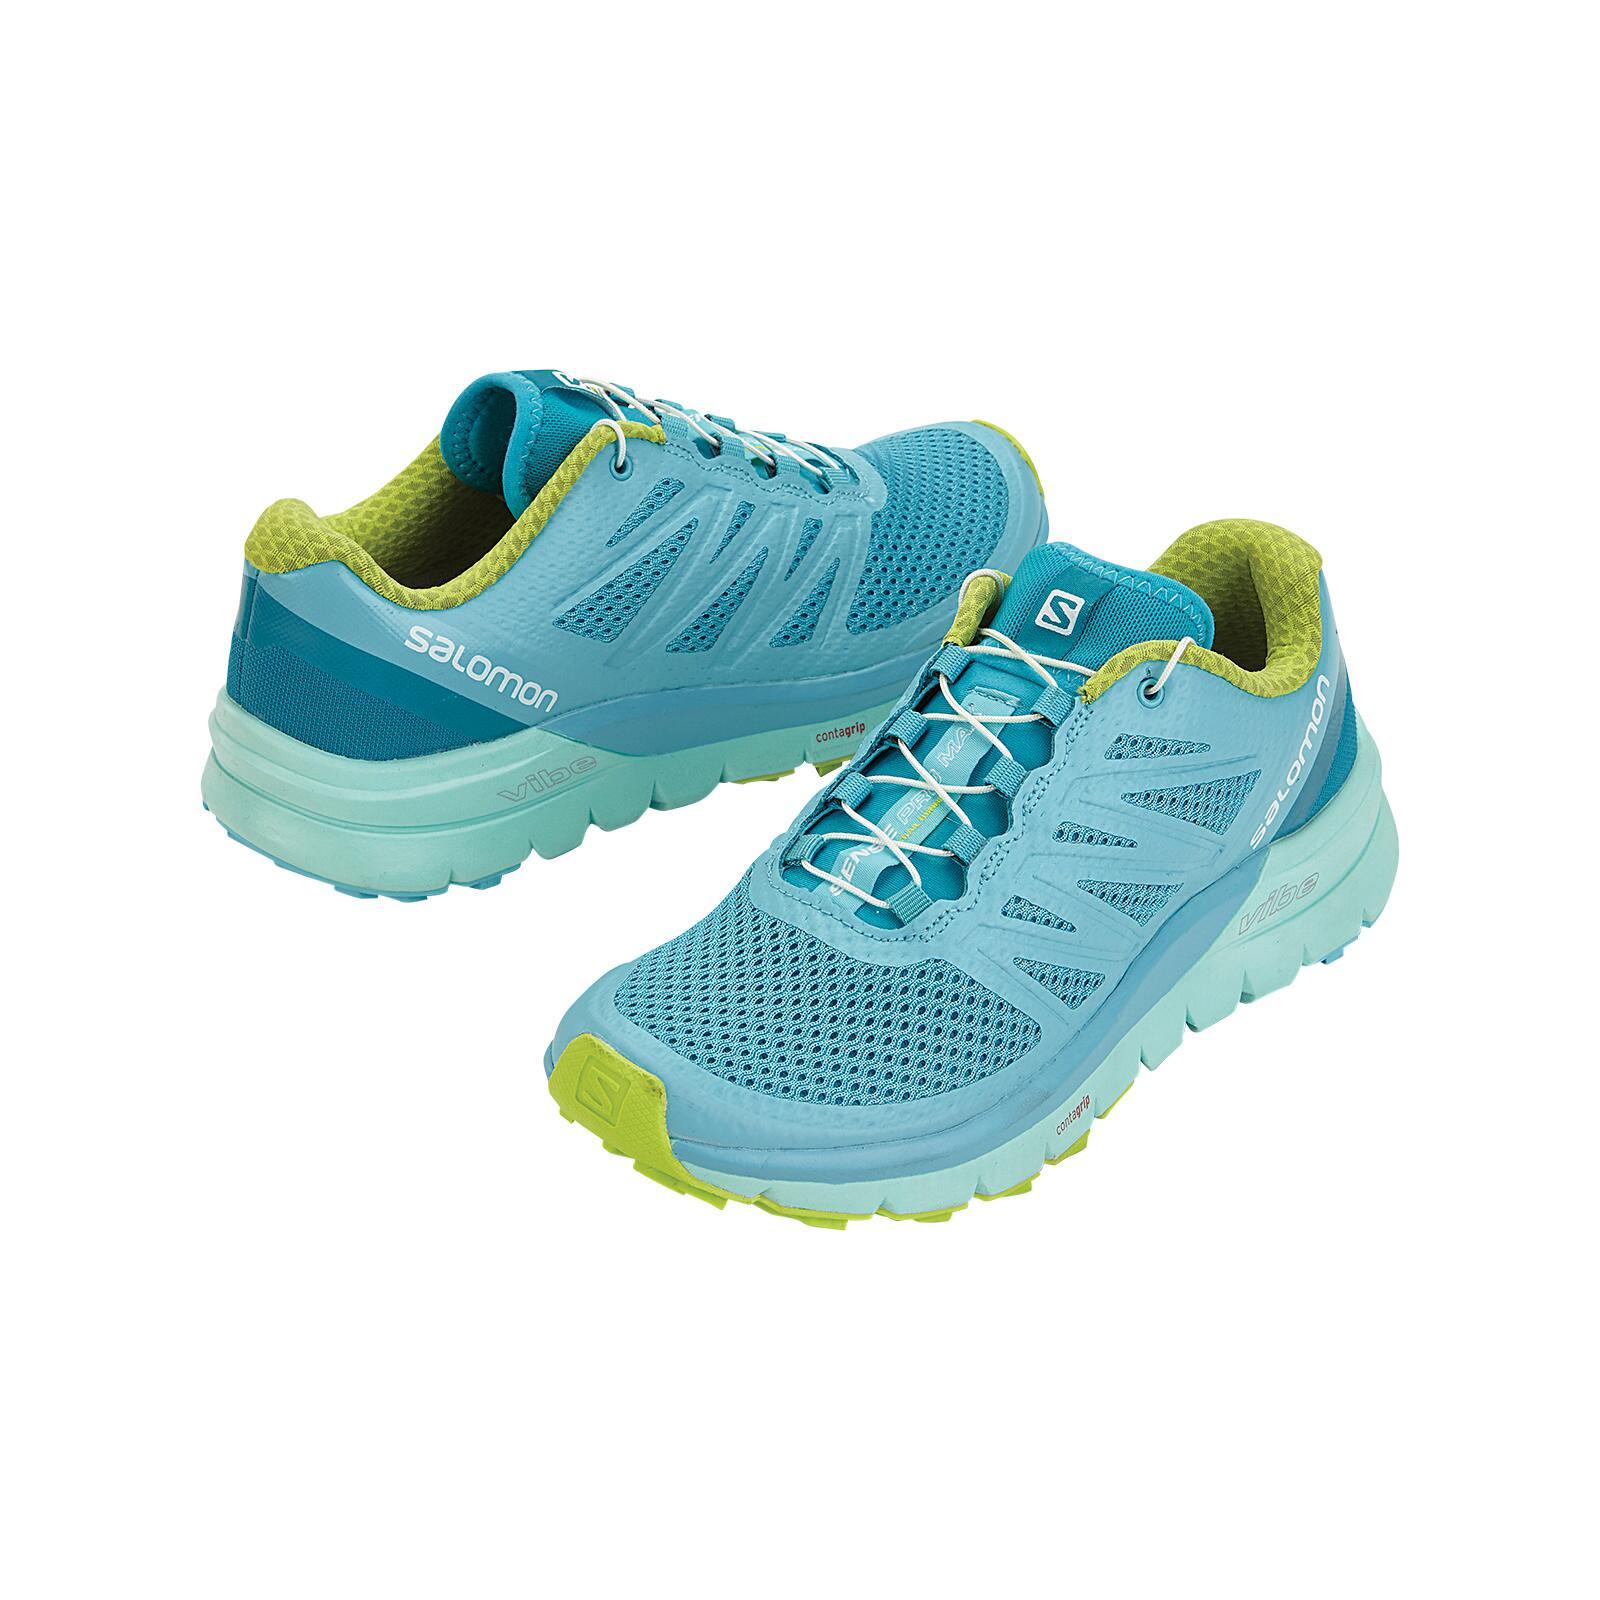 Salomon Sense Ride GTX Invisible Fit Trail Running Shoes Women's | REI Outlet